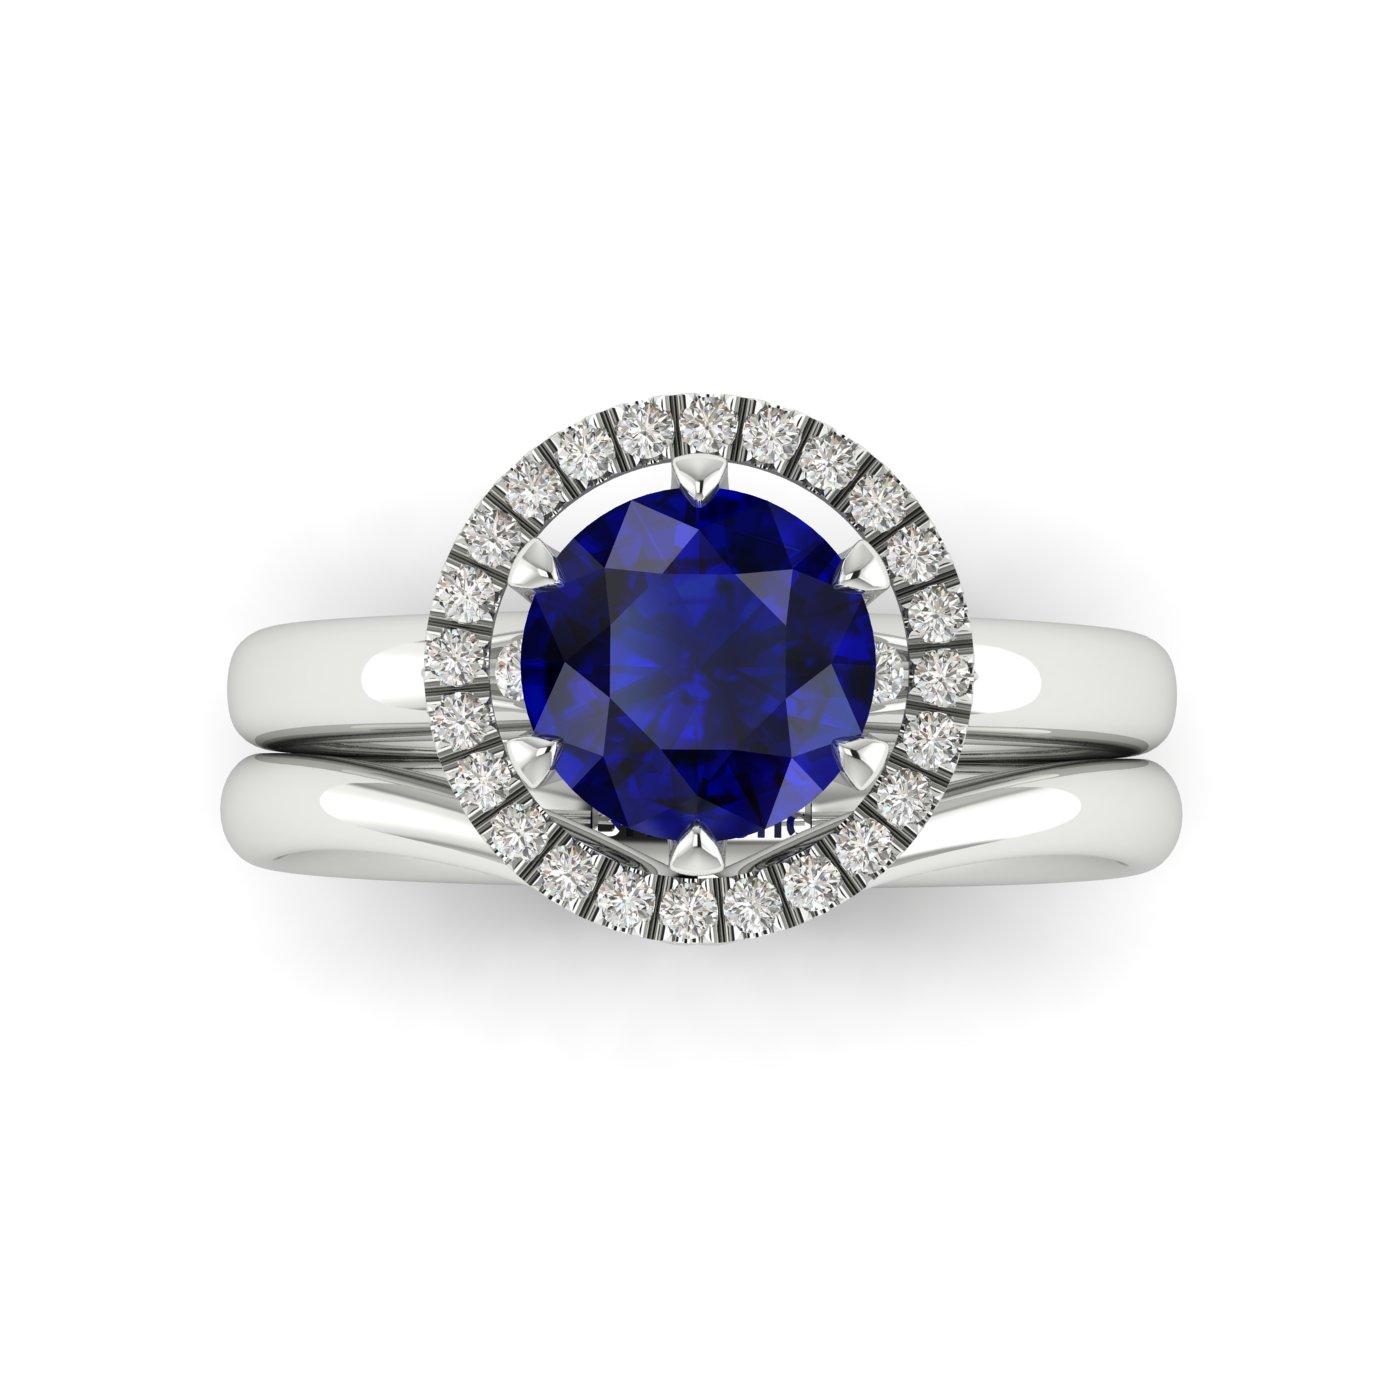 Diamond Halo Ring Guard Enhancer Byond_image2